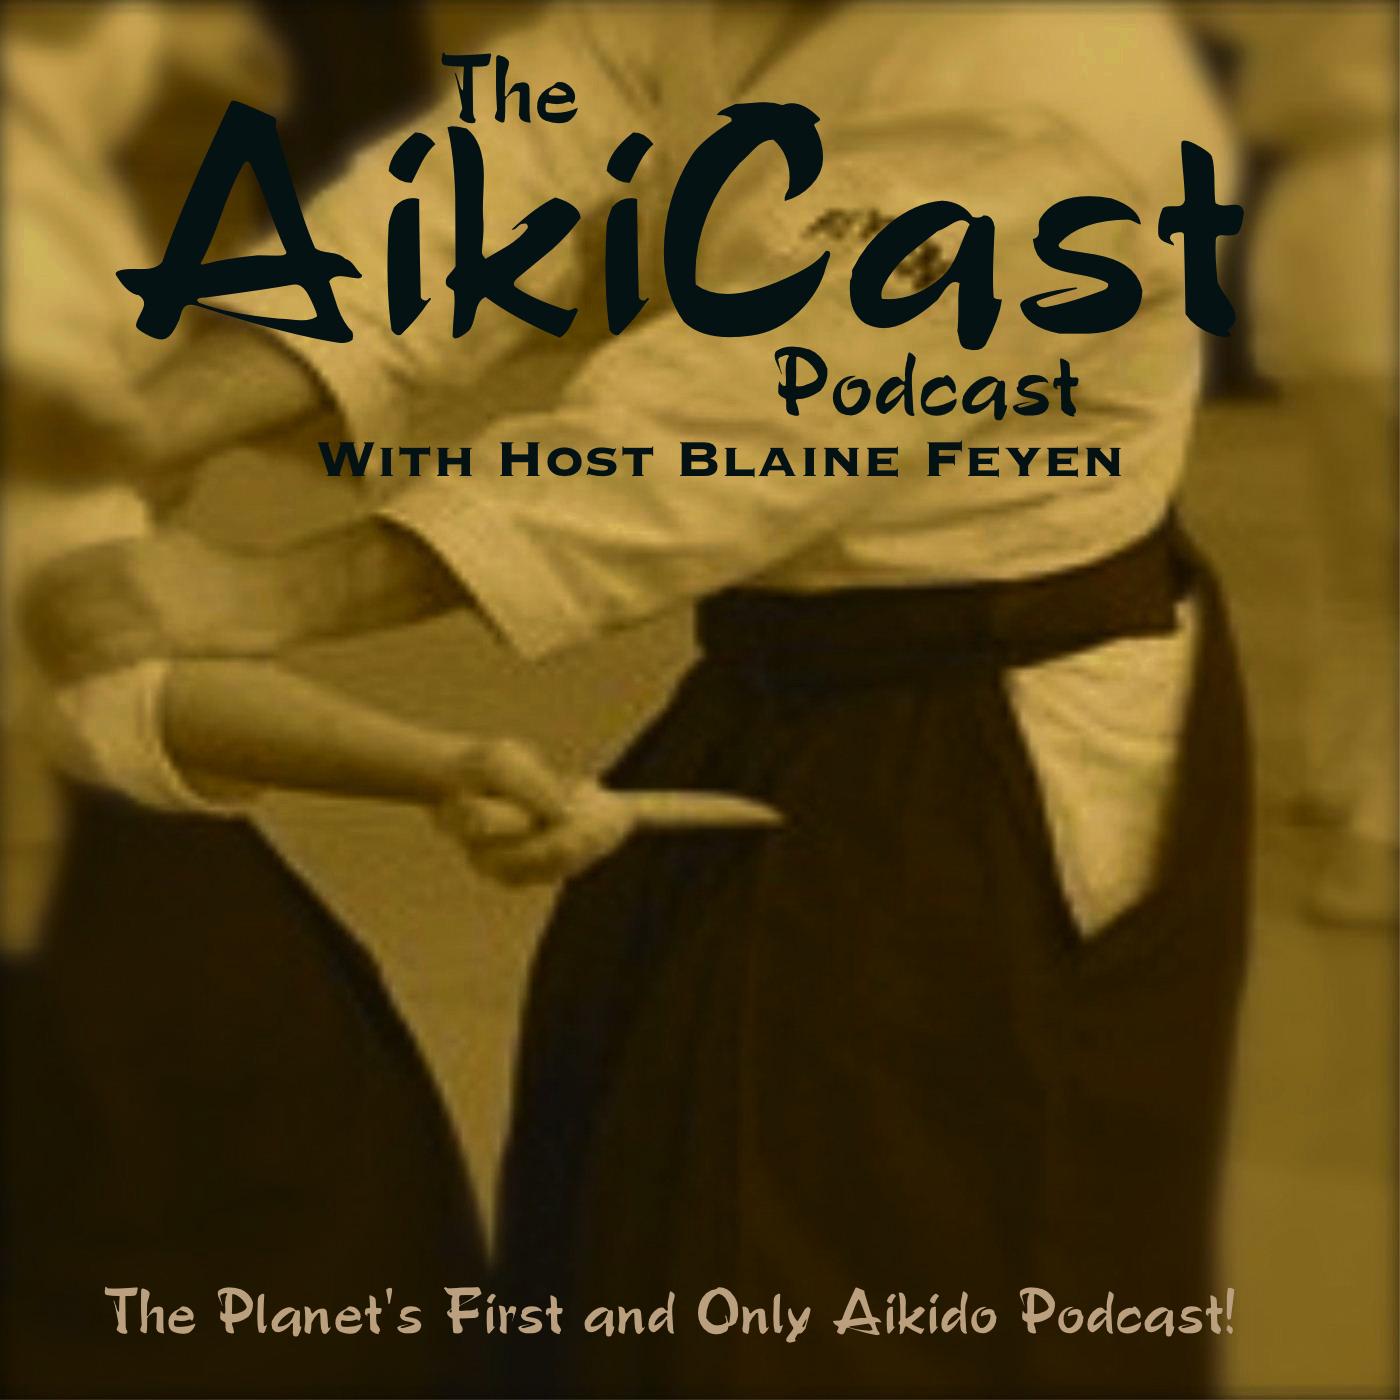 AikiCast